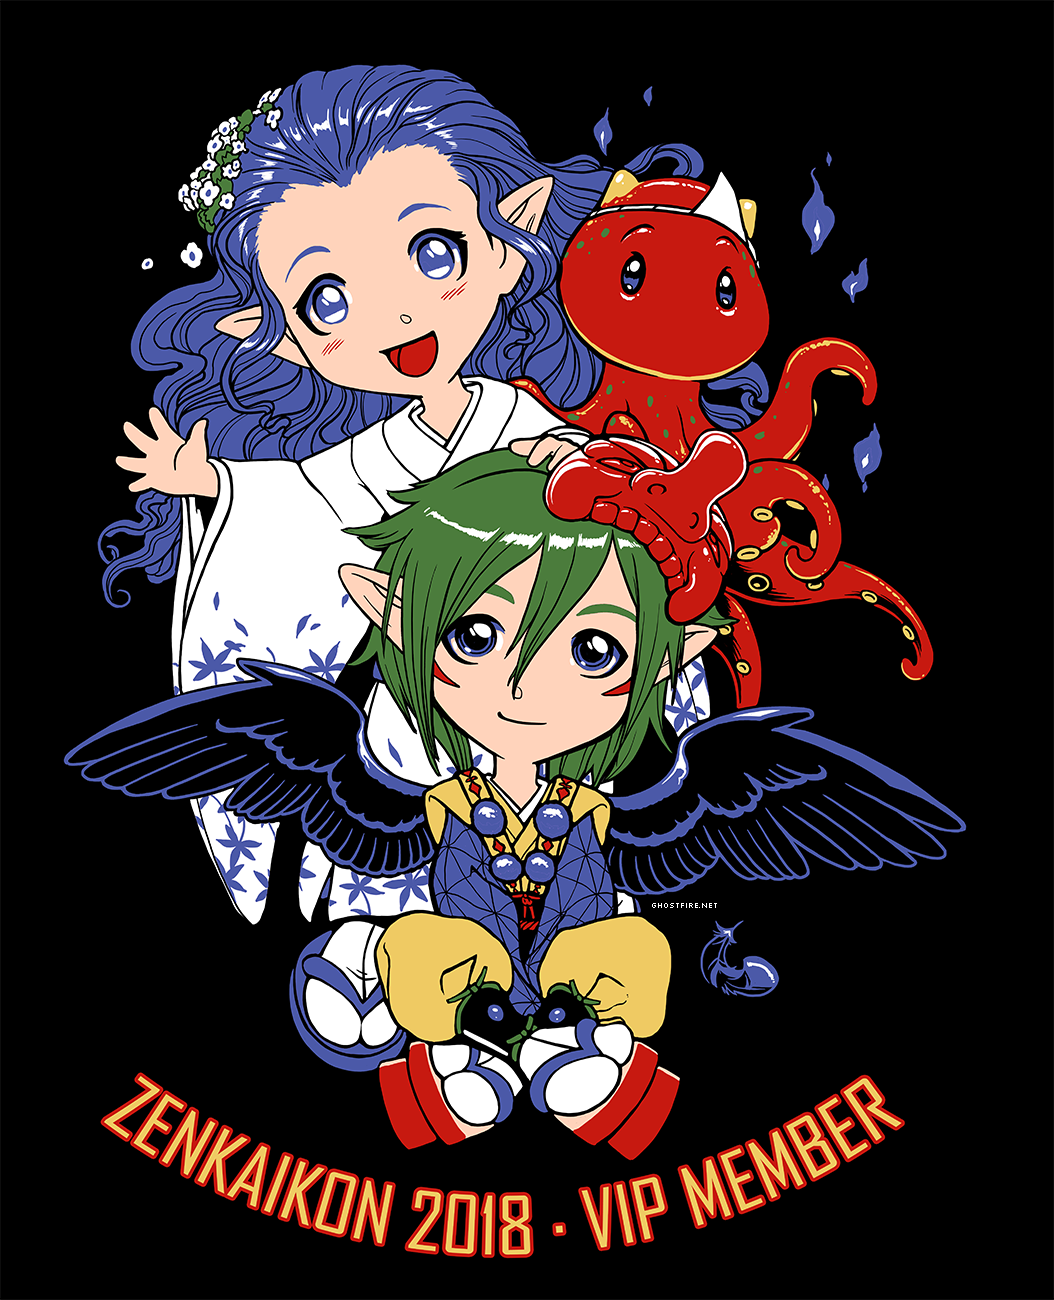 Zenkaikon 2018 VIP Shirt - Hello! by ghostfire